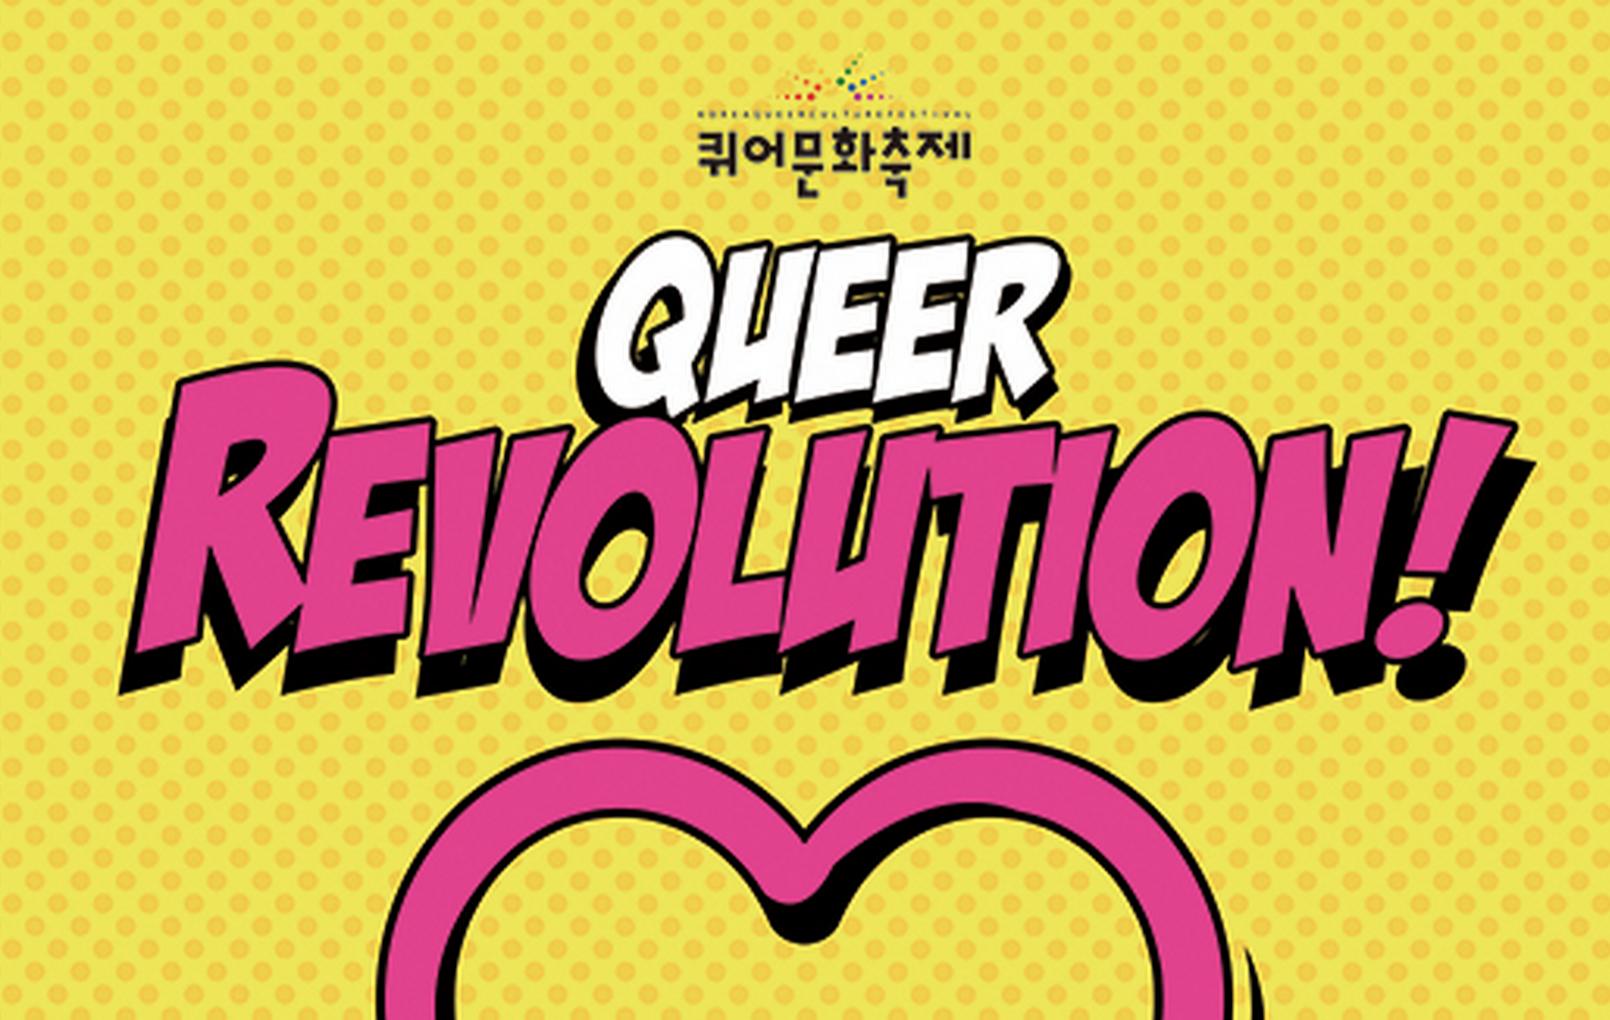 korea queer festival 2015